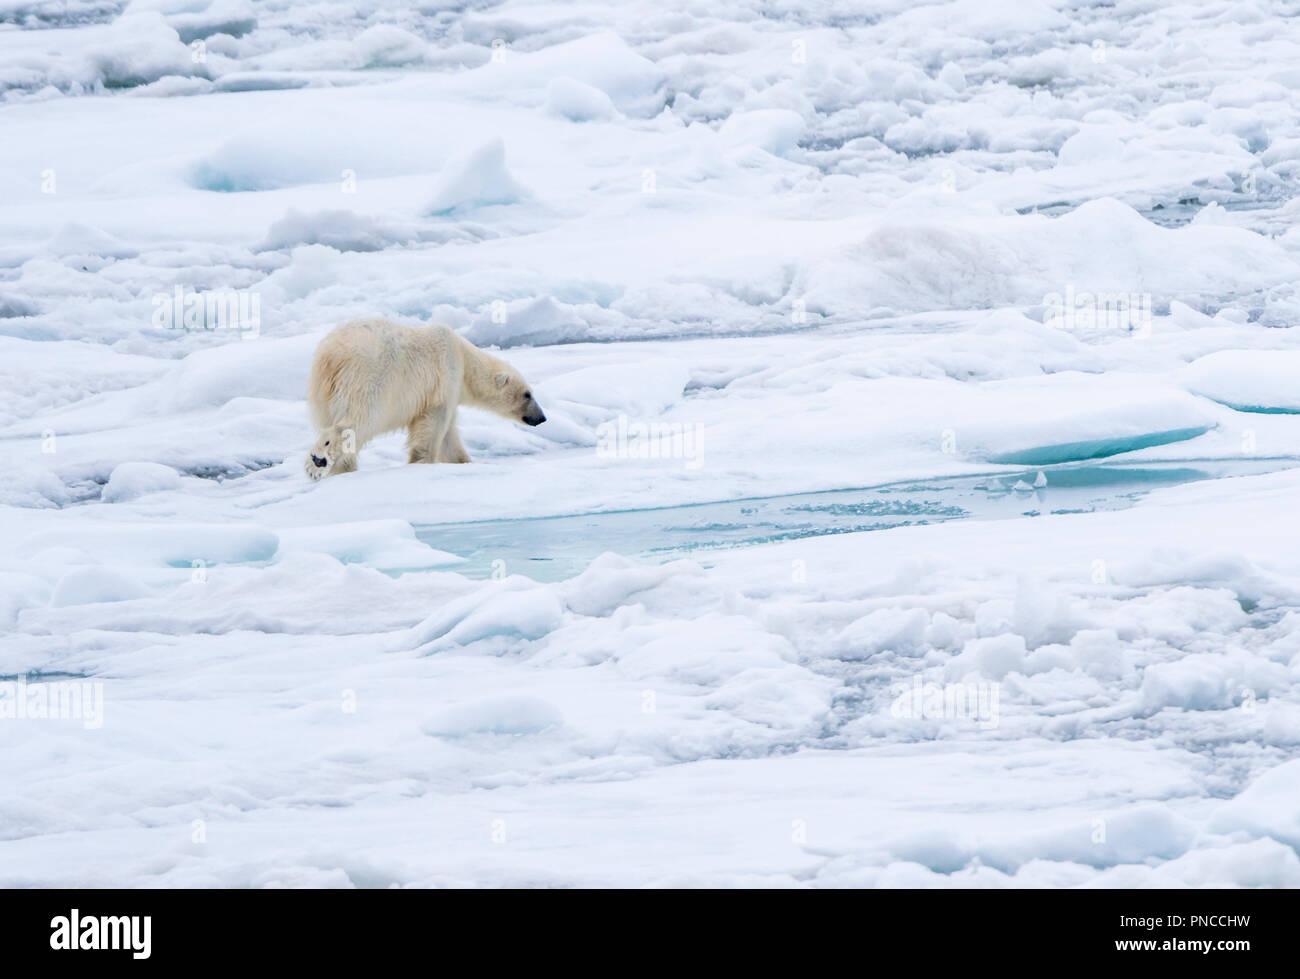 Polar bear traveling over sea ice off the coast of Svalbard